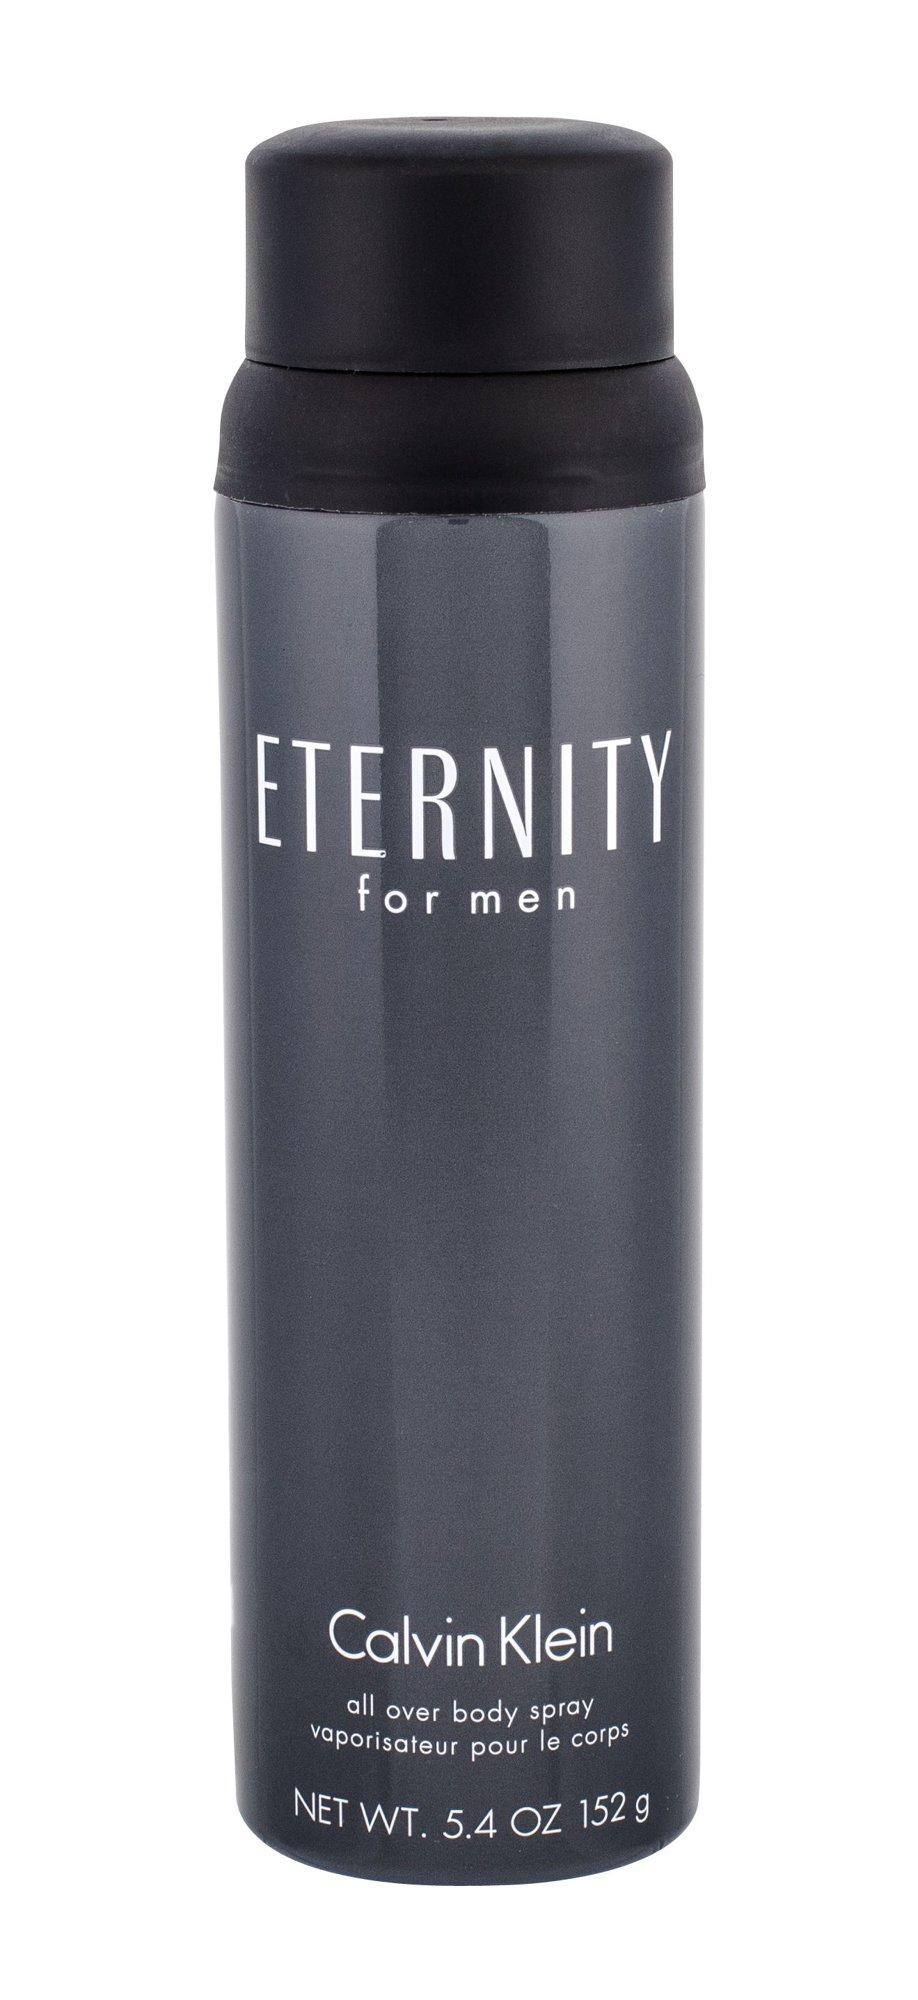 Calvin Klein Eternity Deodorant 160ml